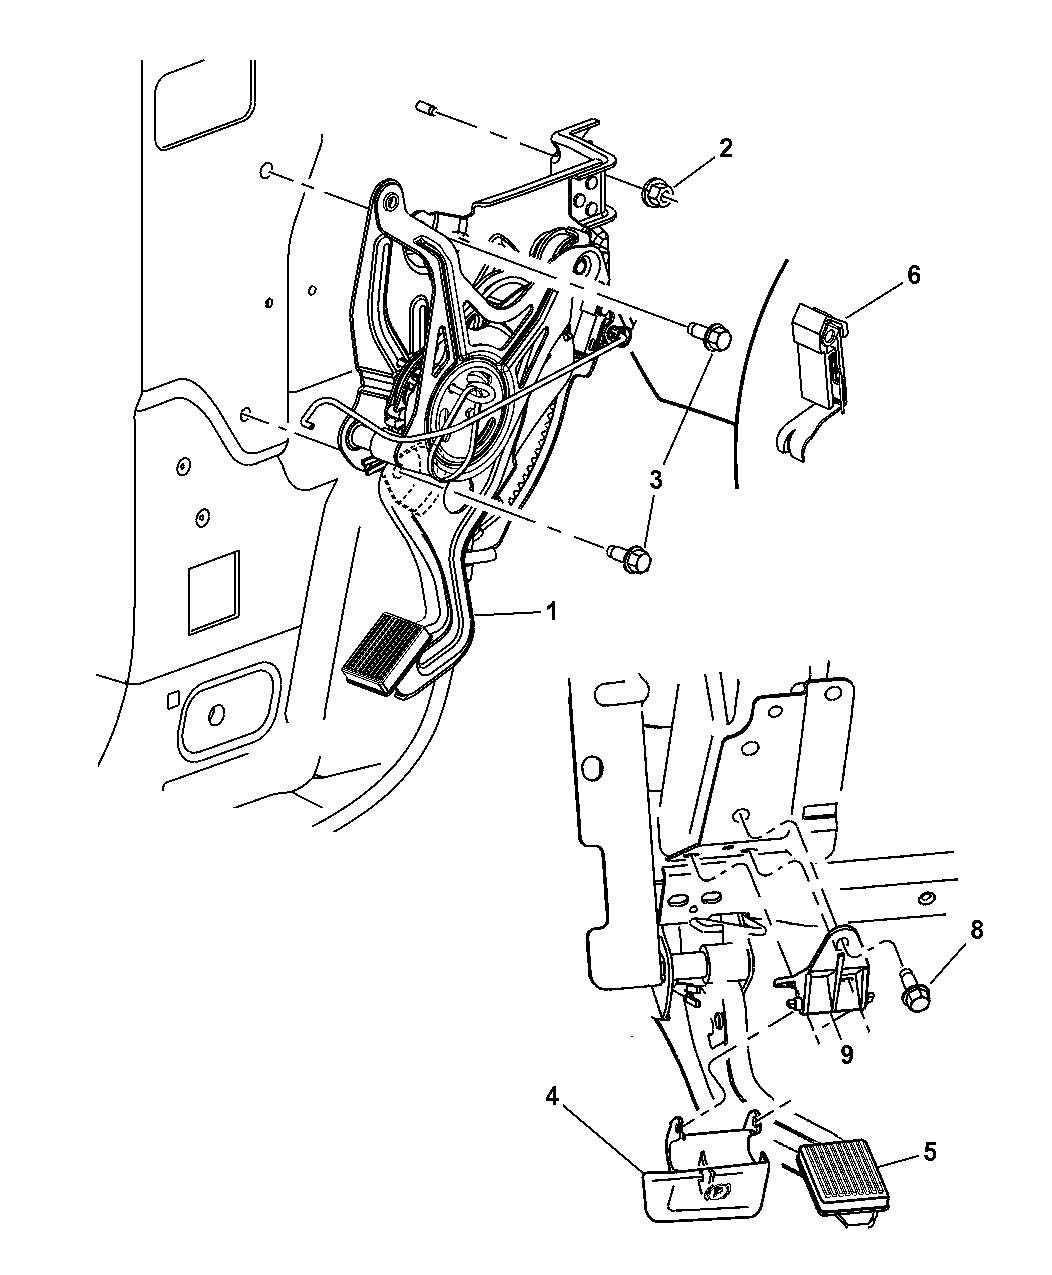 2006 Chrysler Pacifica Lever Parking Brake Mopar Parts Giant Engine Diagram